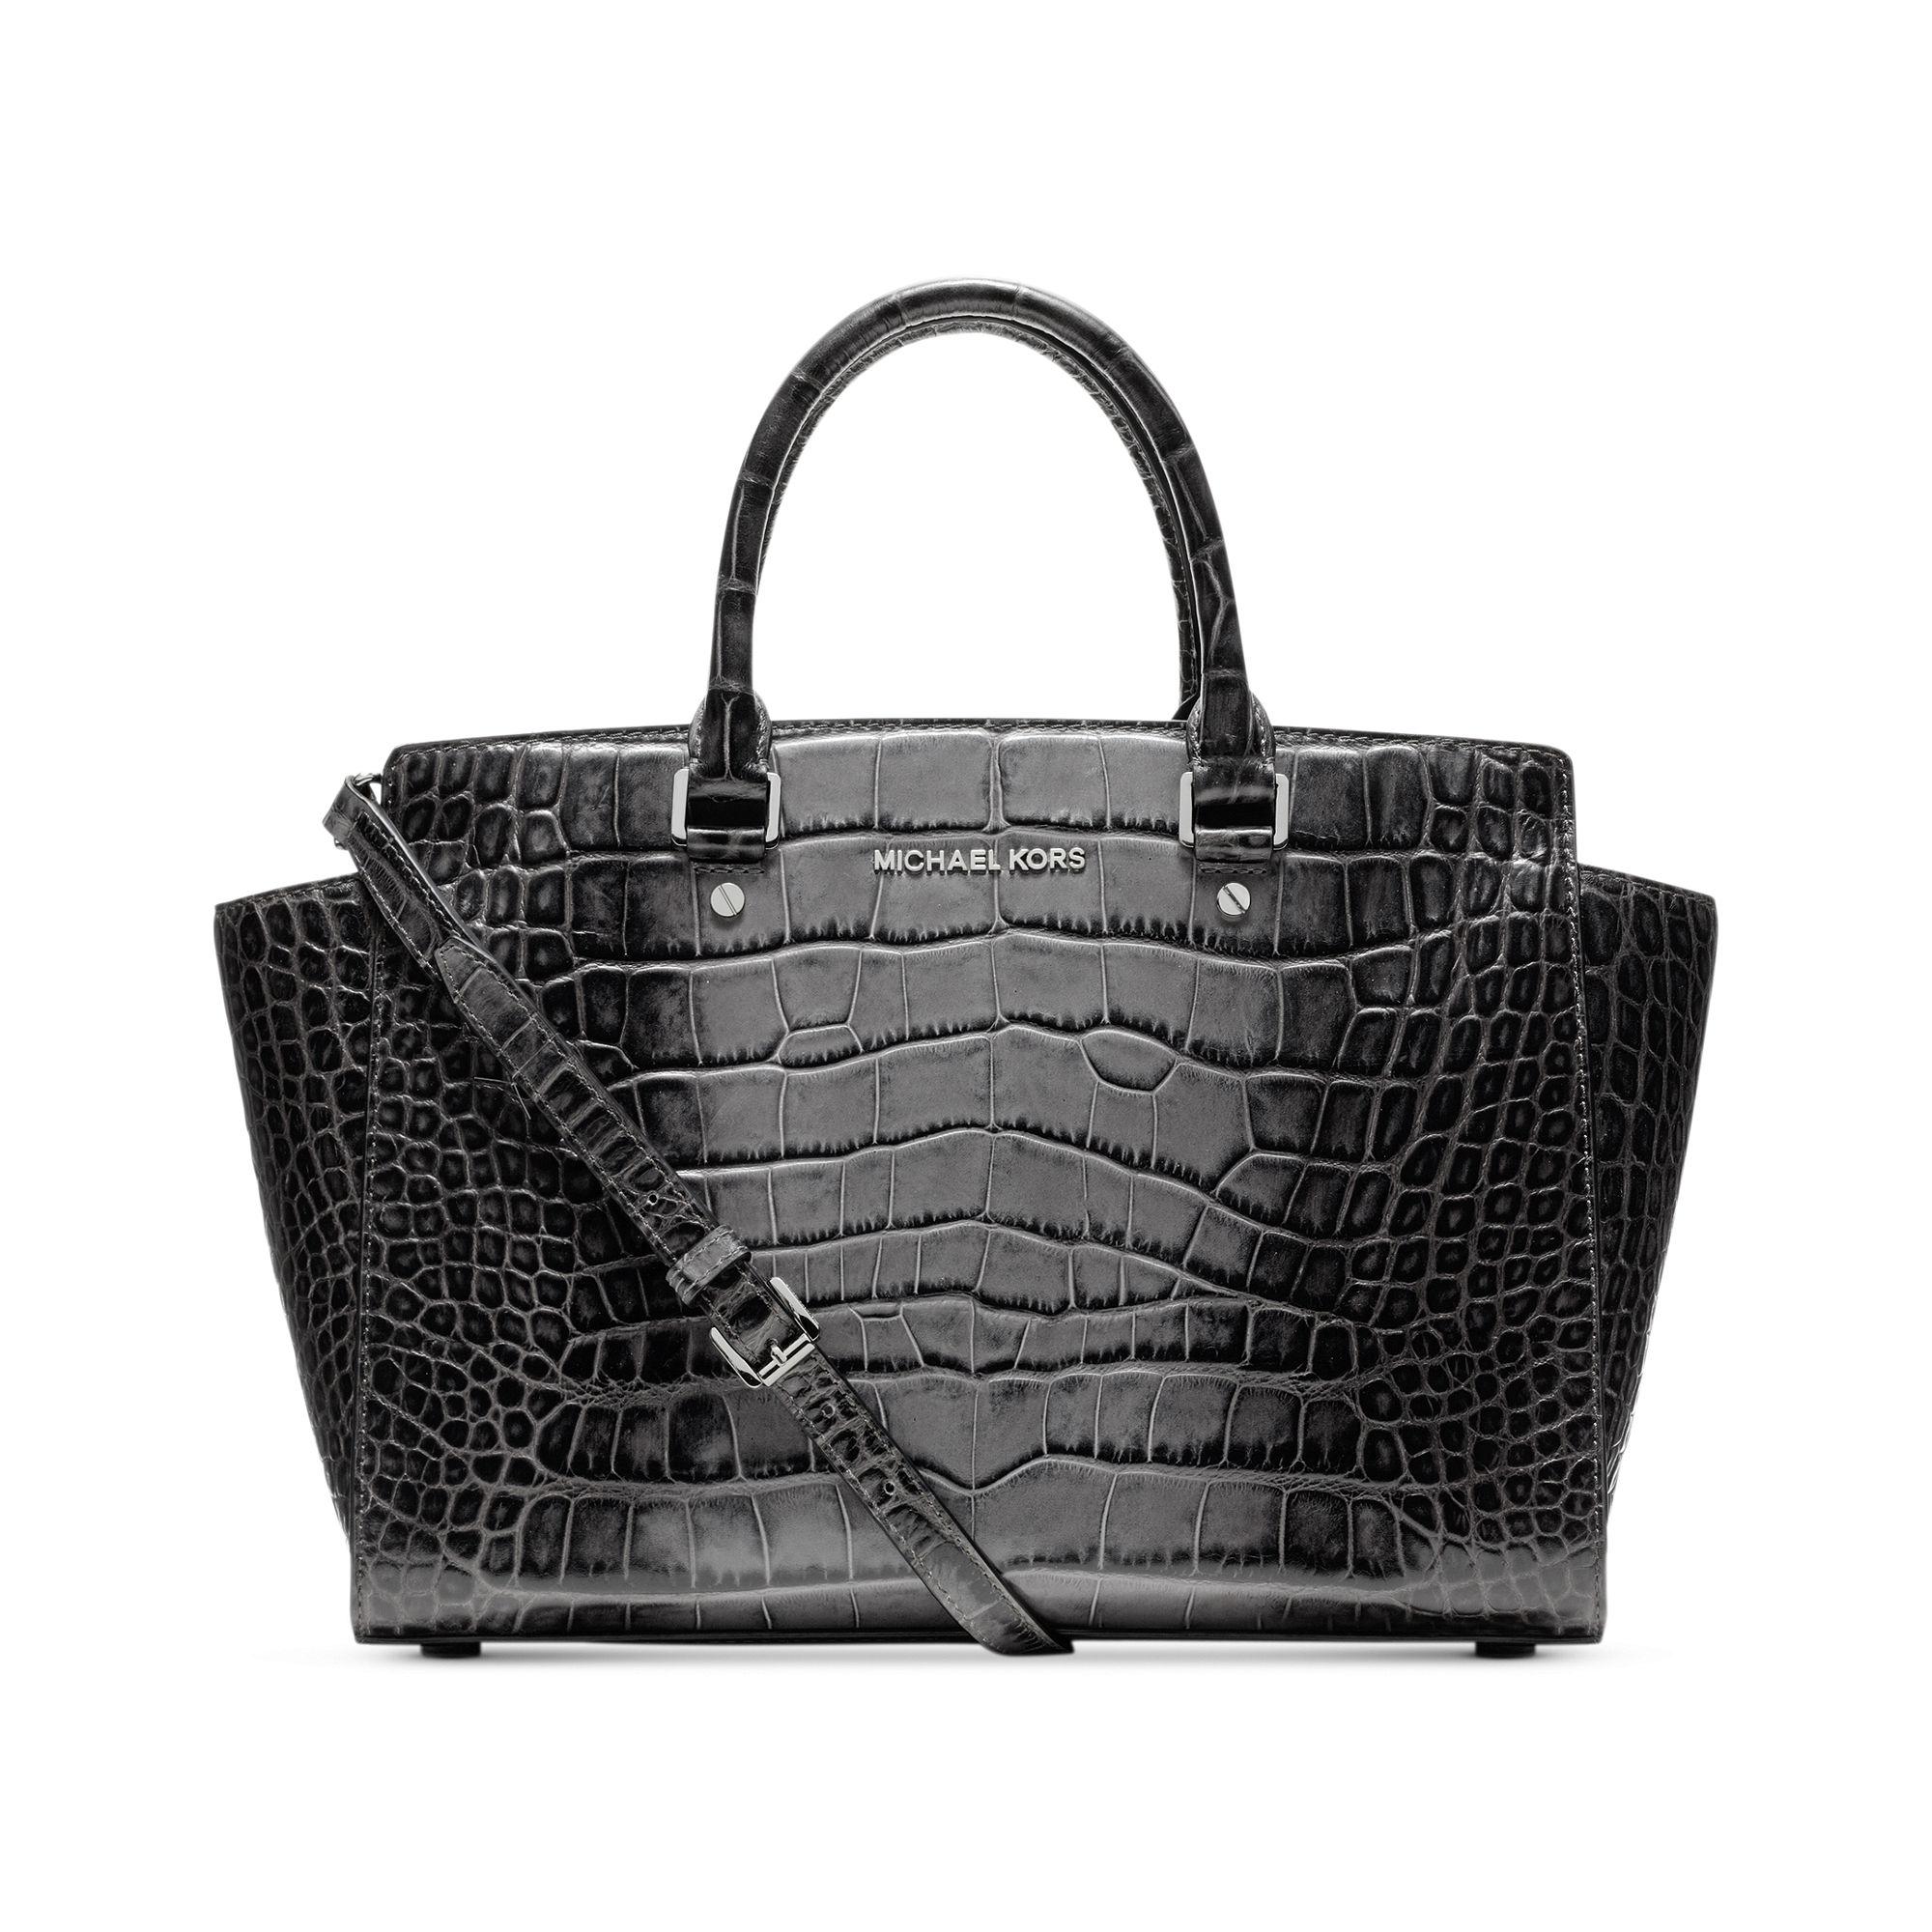 michael kors selma large croco satchel in black grey lyst. Black Bedroom Furniture Sets. Home Design Ideas